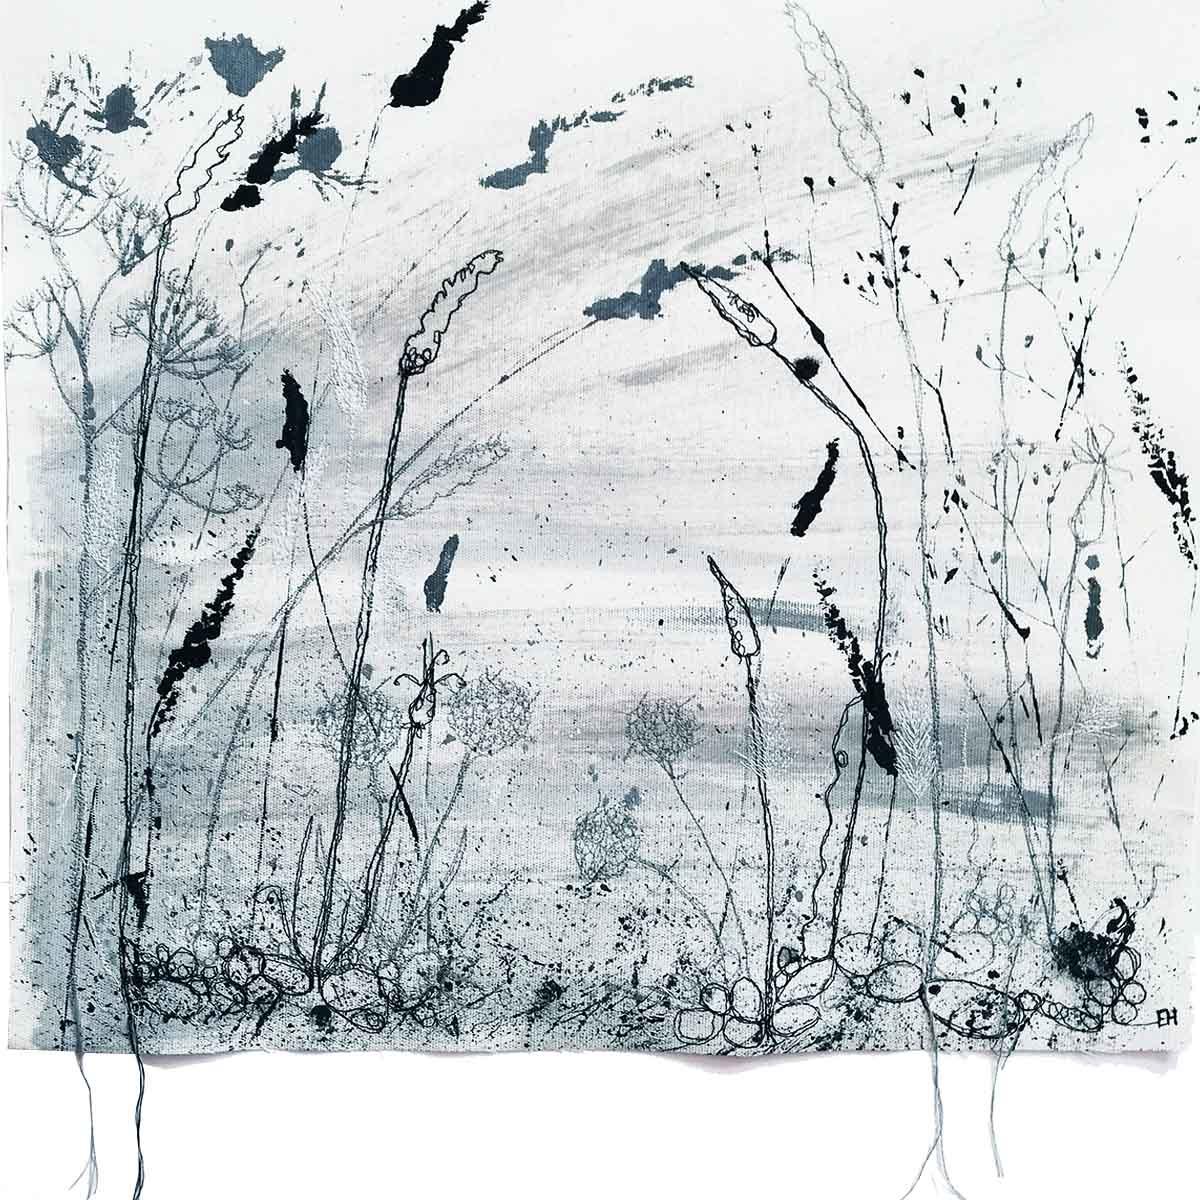 Autumn Shoreline Original painting front page by artist Ellie Hipkin